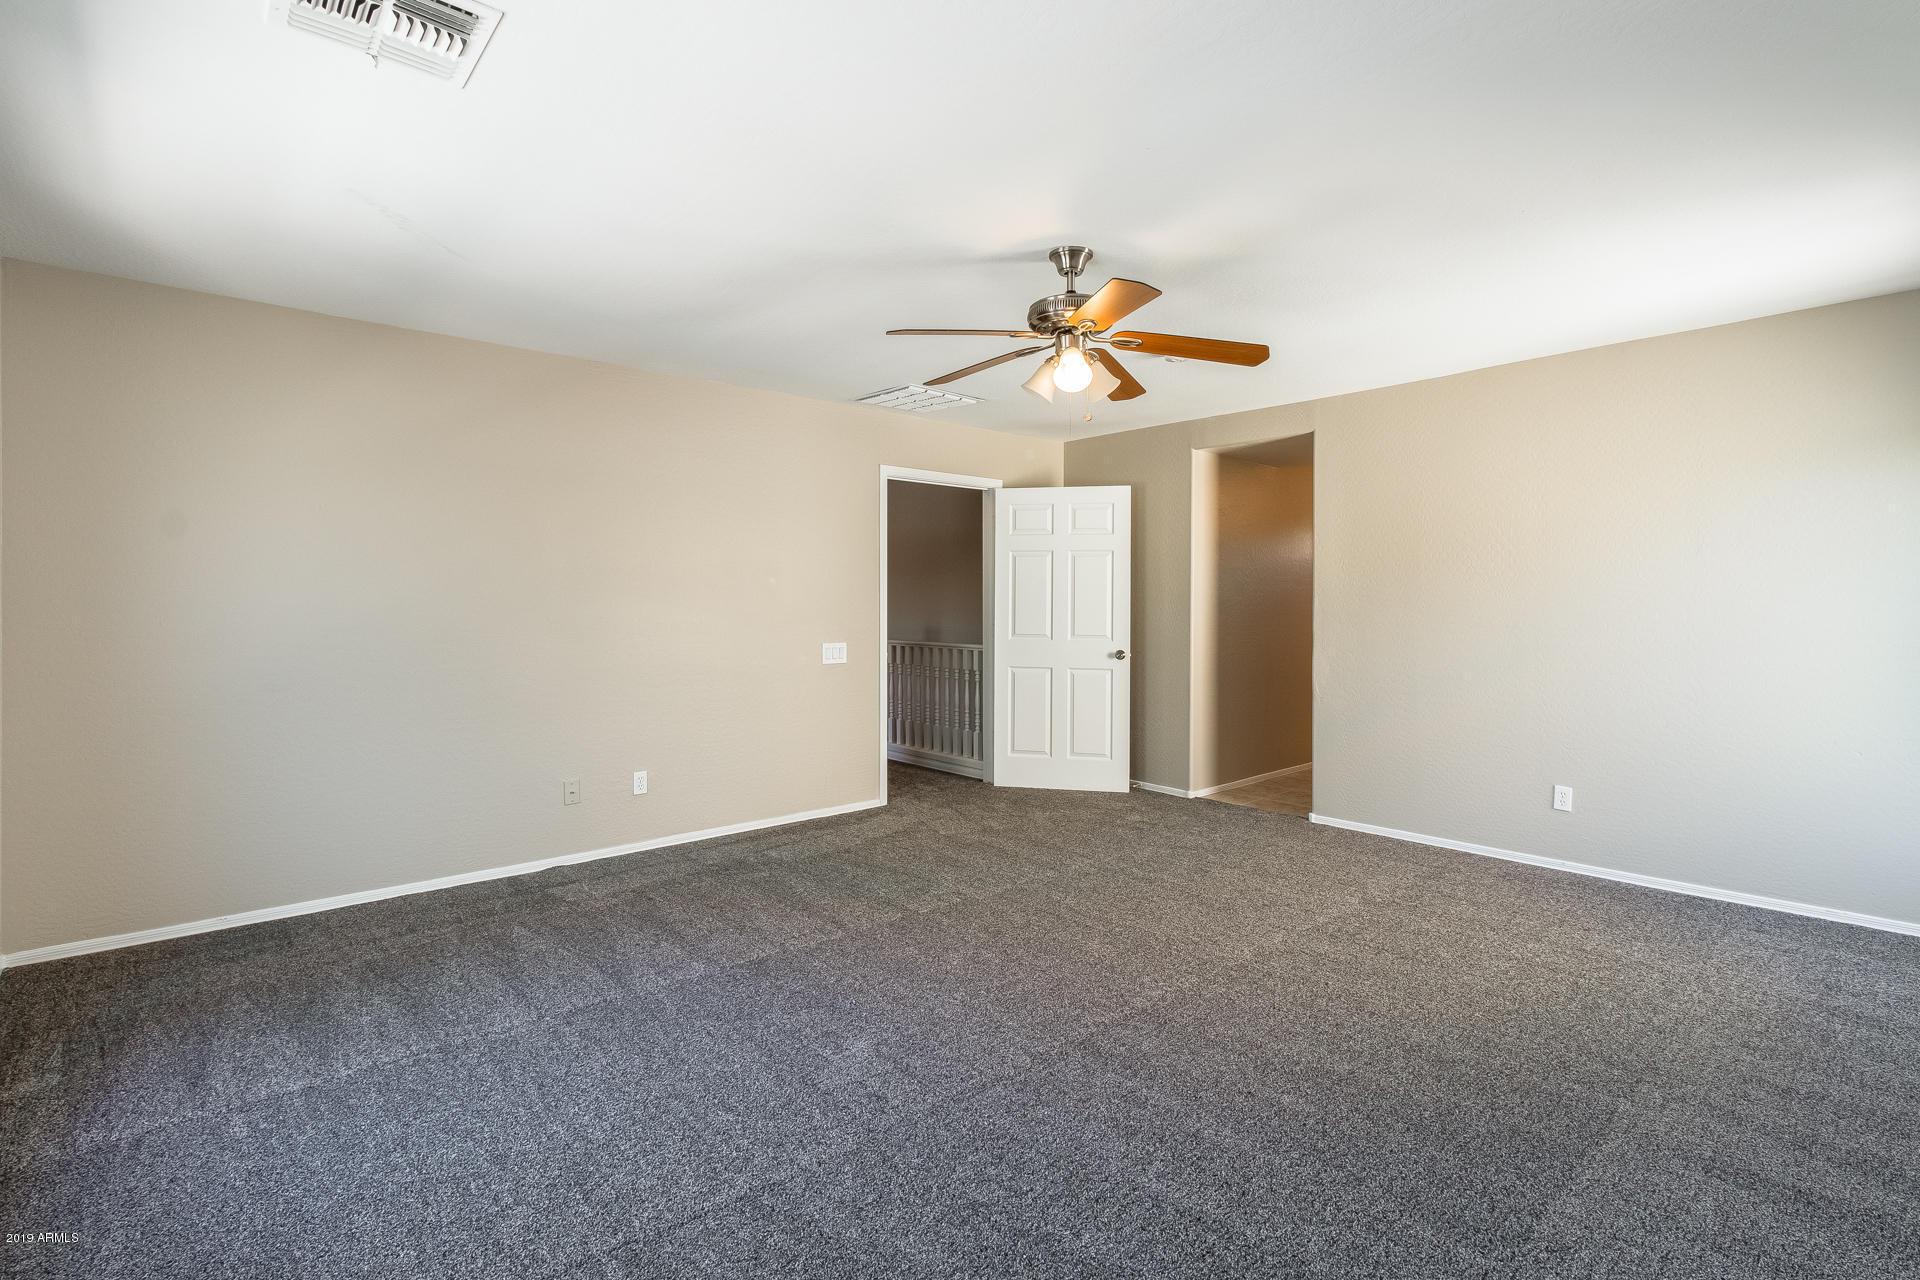 MLS 5931488 11868 W SHERMAN Street, Avondale, AZ 85323 Avondale AZ Glenhurst